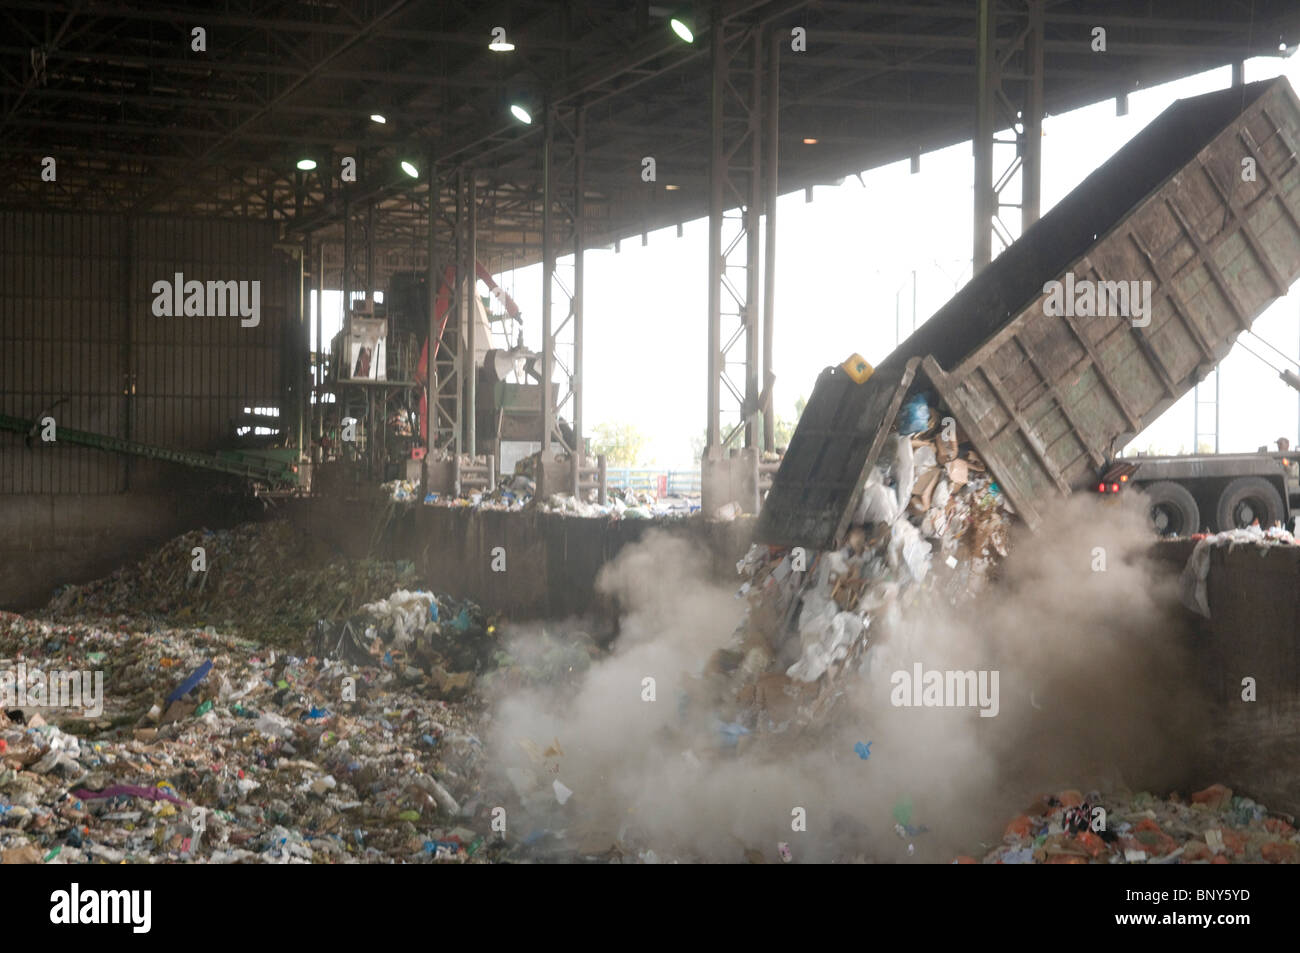 Domestic waste treatment centre - Stock Image